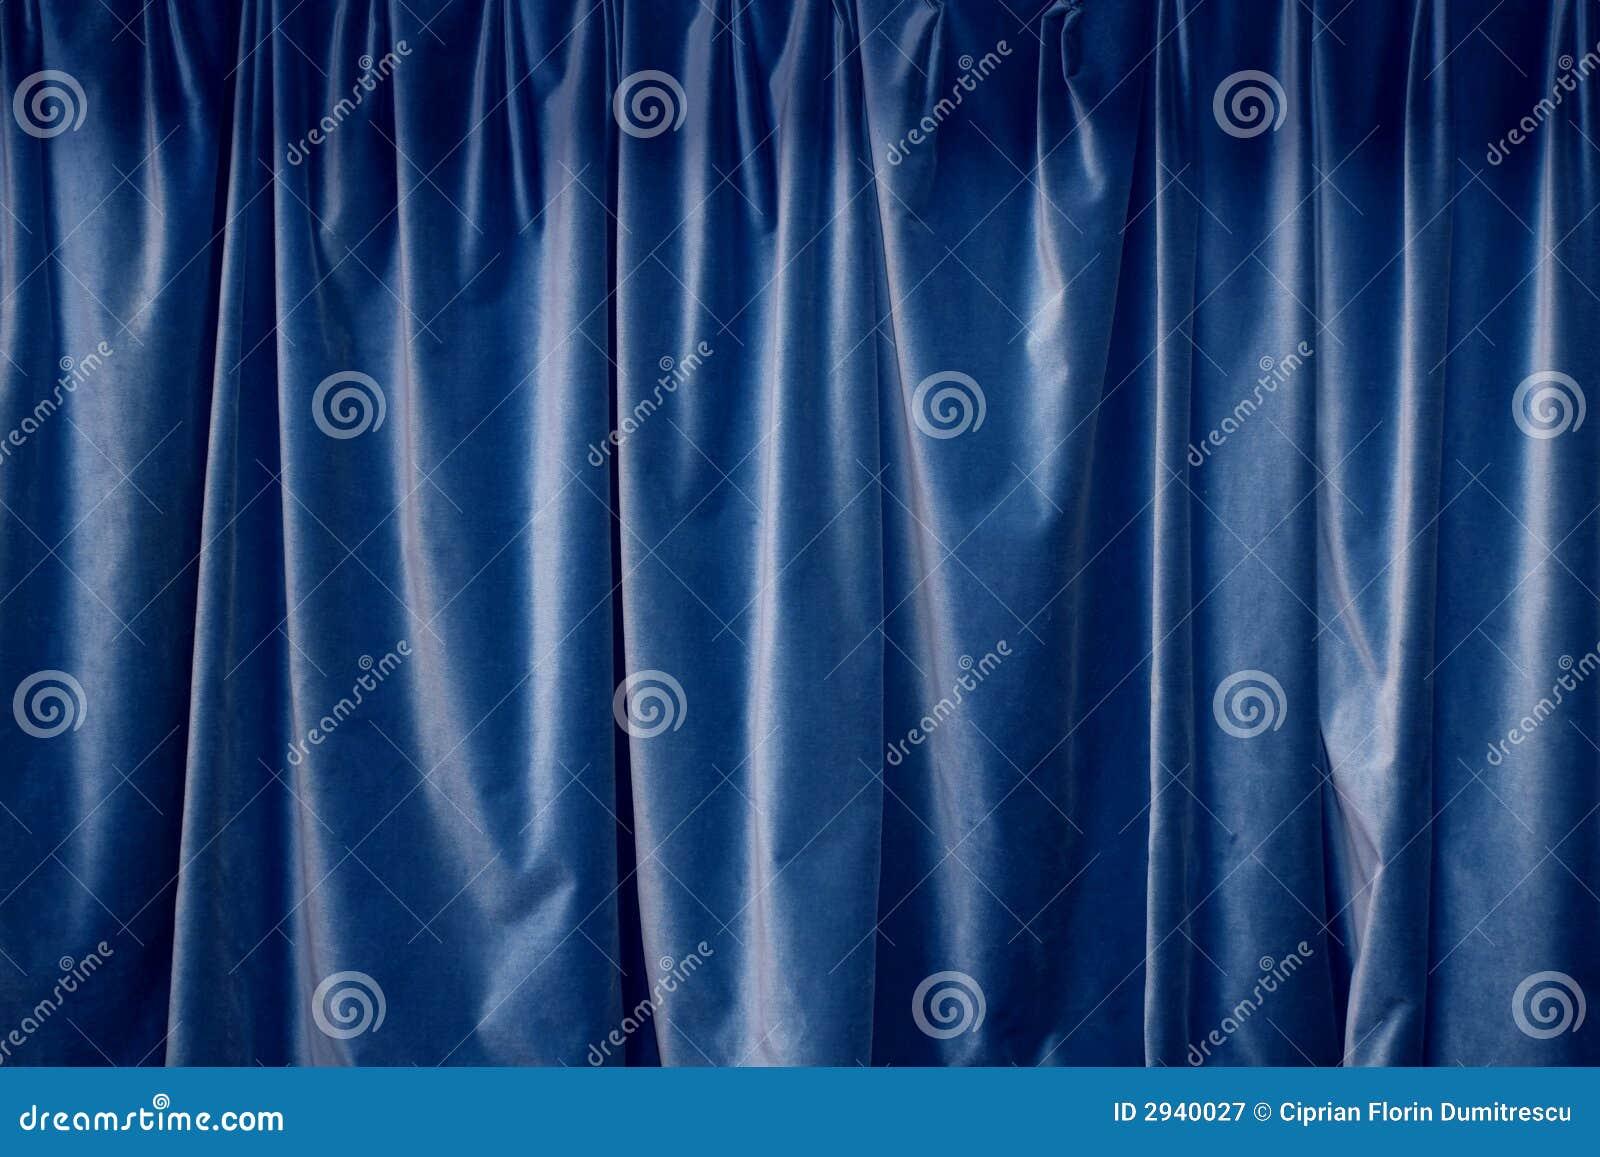 rideaux bleu